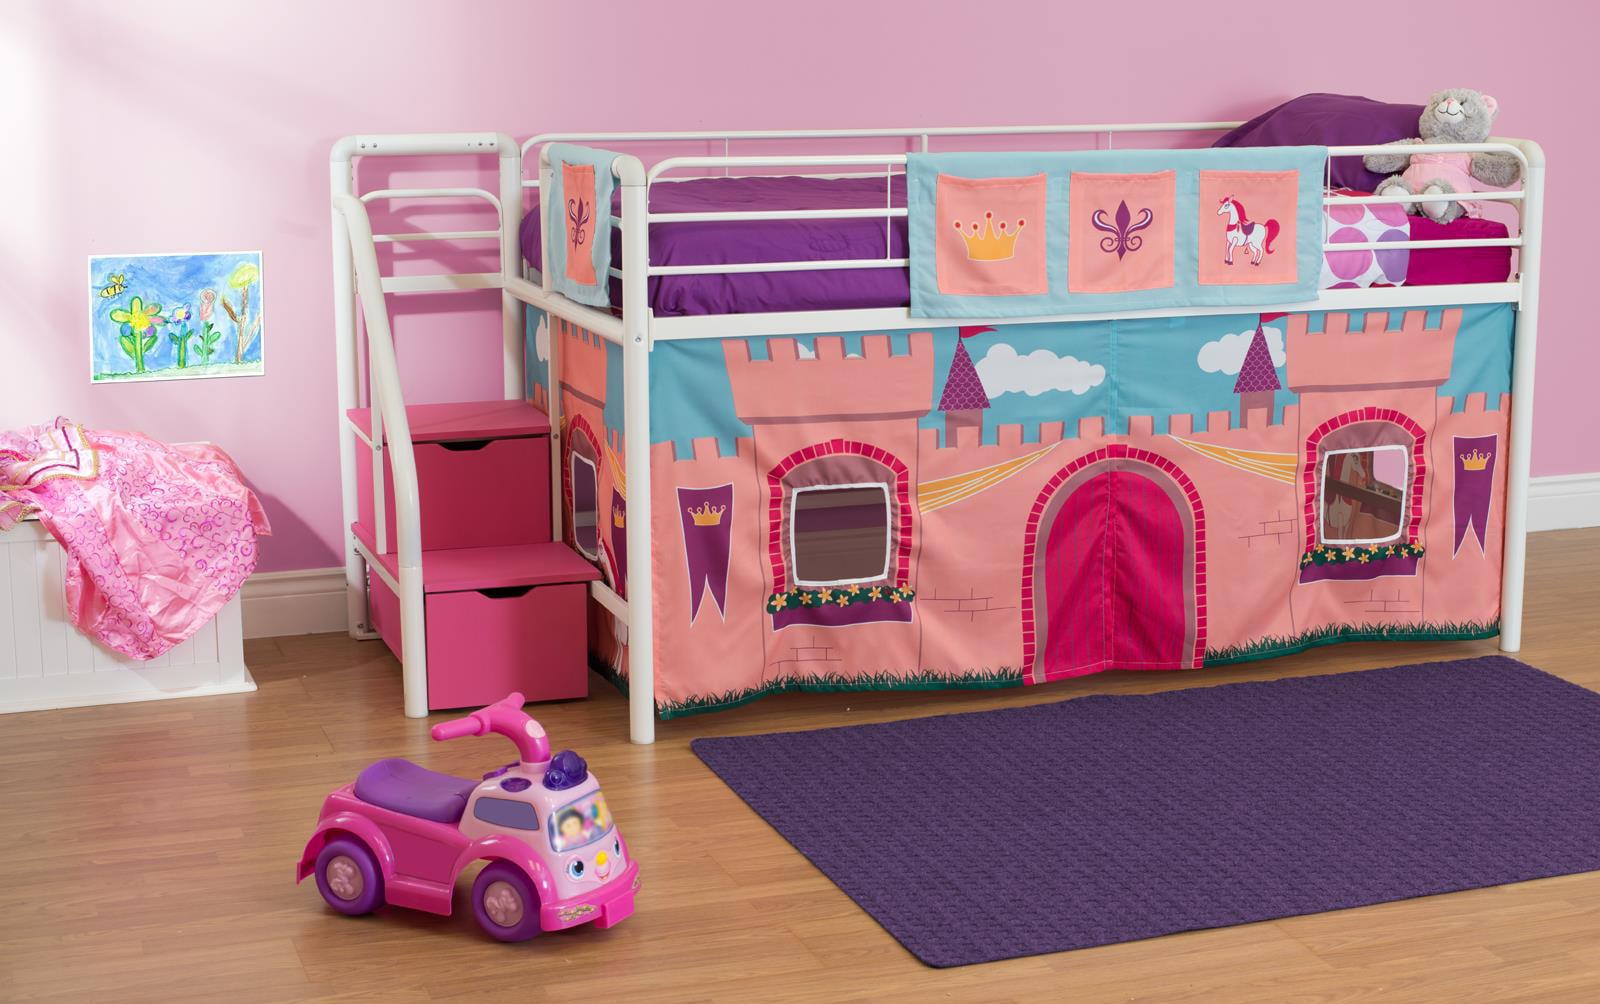 Dhp Junior Metal Loft Bed With Storage Steps And Princess Castle Curtain Set Twin White Pink Walmart Com Walmart Com